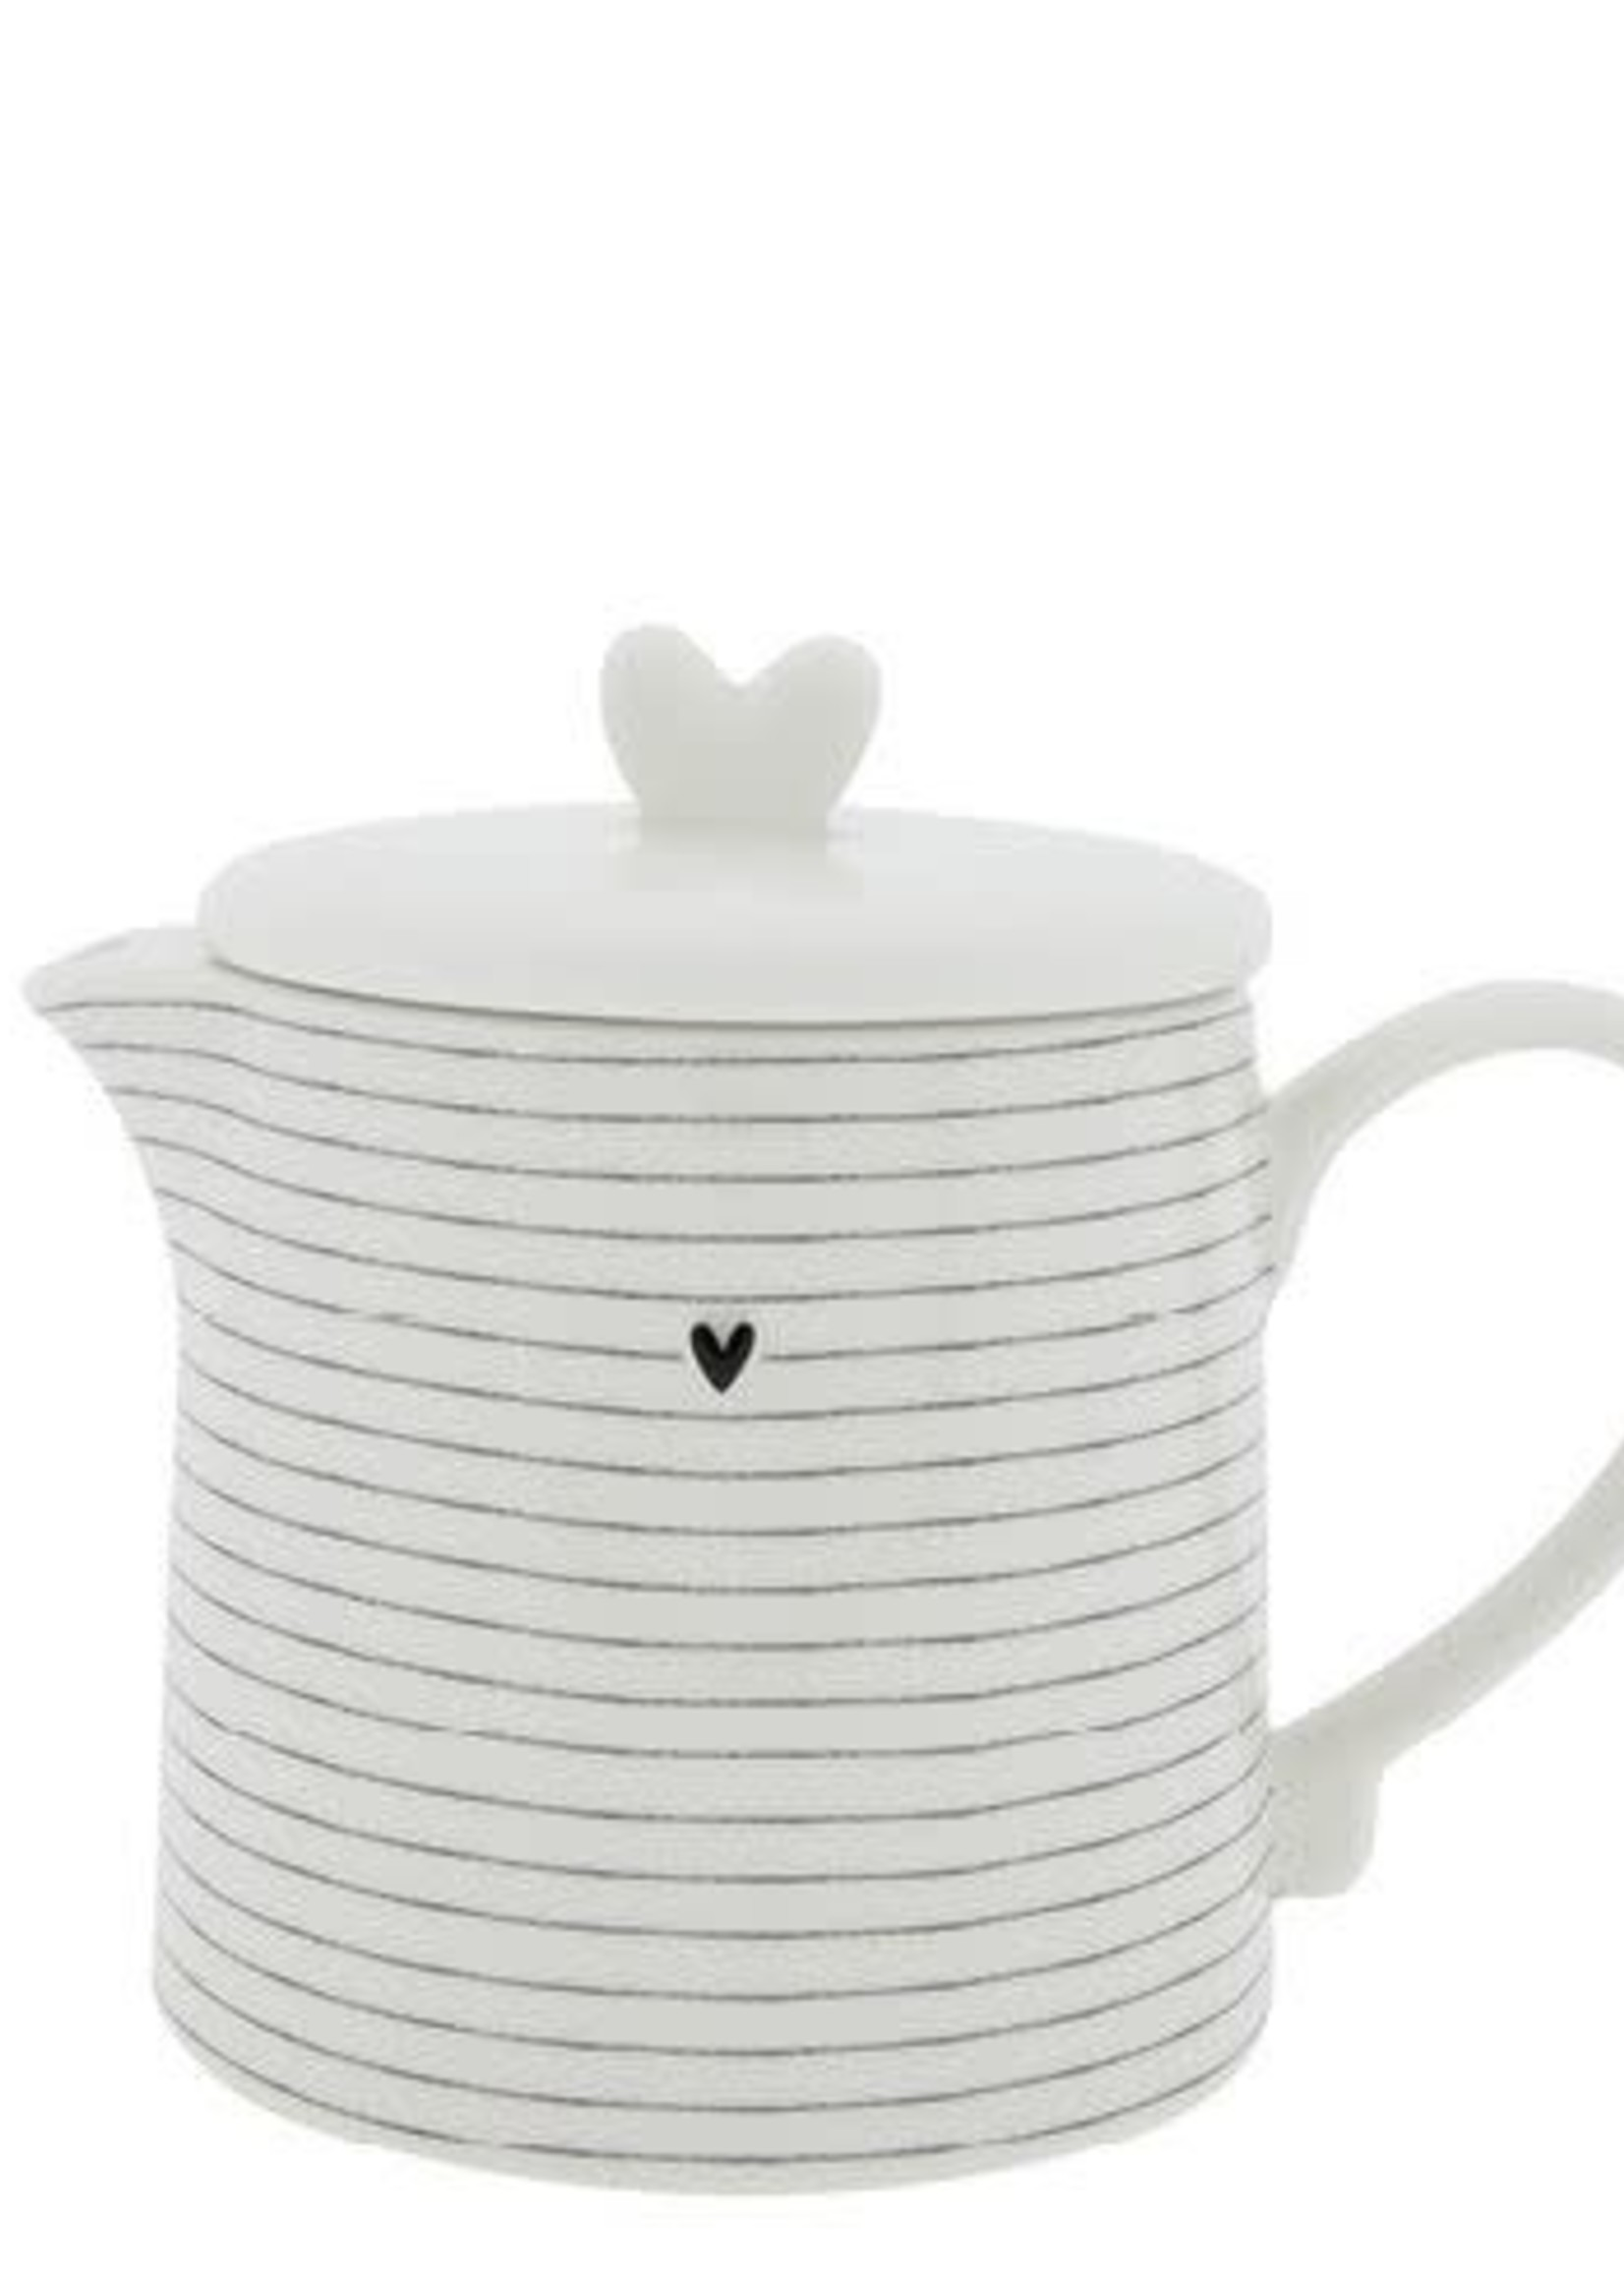 BASTION COLLECTIONS Teapot white w stripes